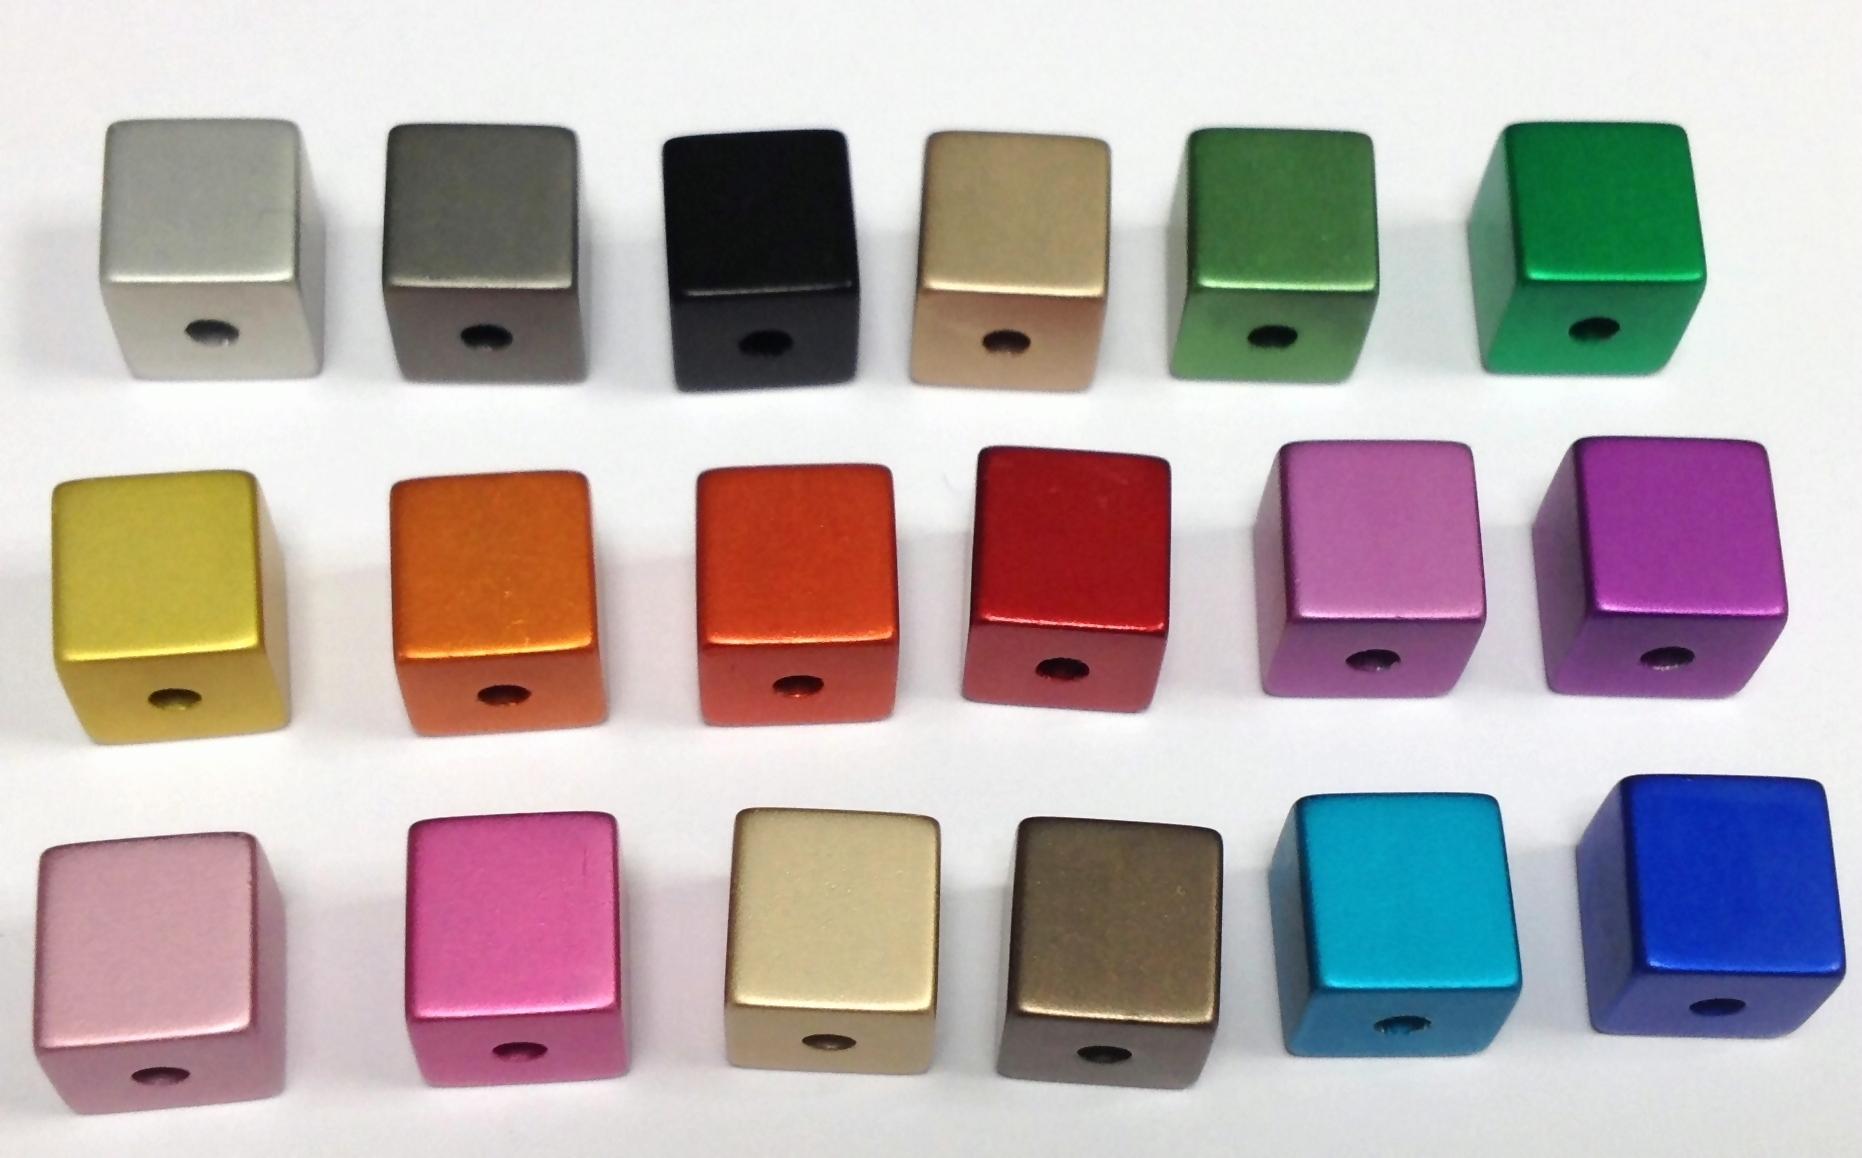 aluminium w rfel eloxiert 8x8mm 18 st ck in verschiedenen farben bunt mehrfarbig weitere. Black Bedroom Furniture Sets. Home Design Ideas